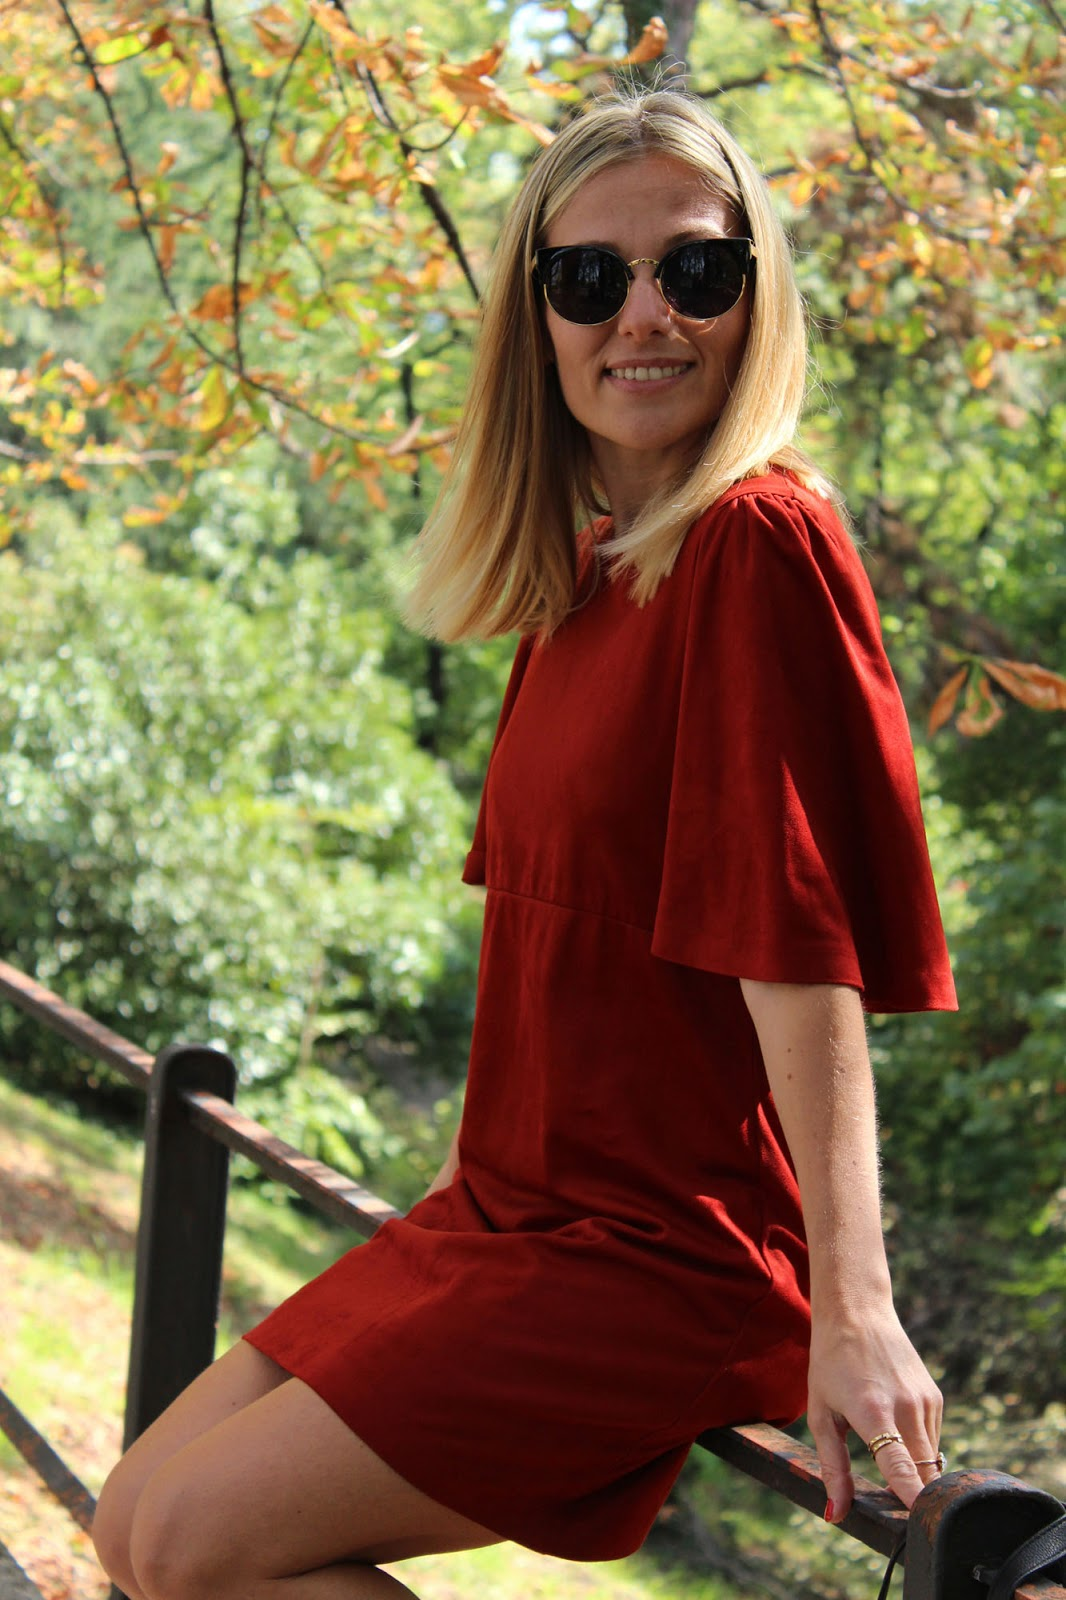 Eniwhere Fashion - Second blog's birthday